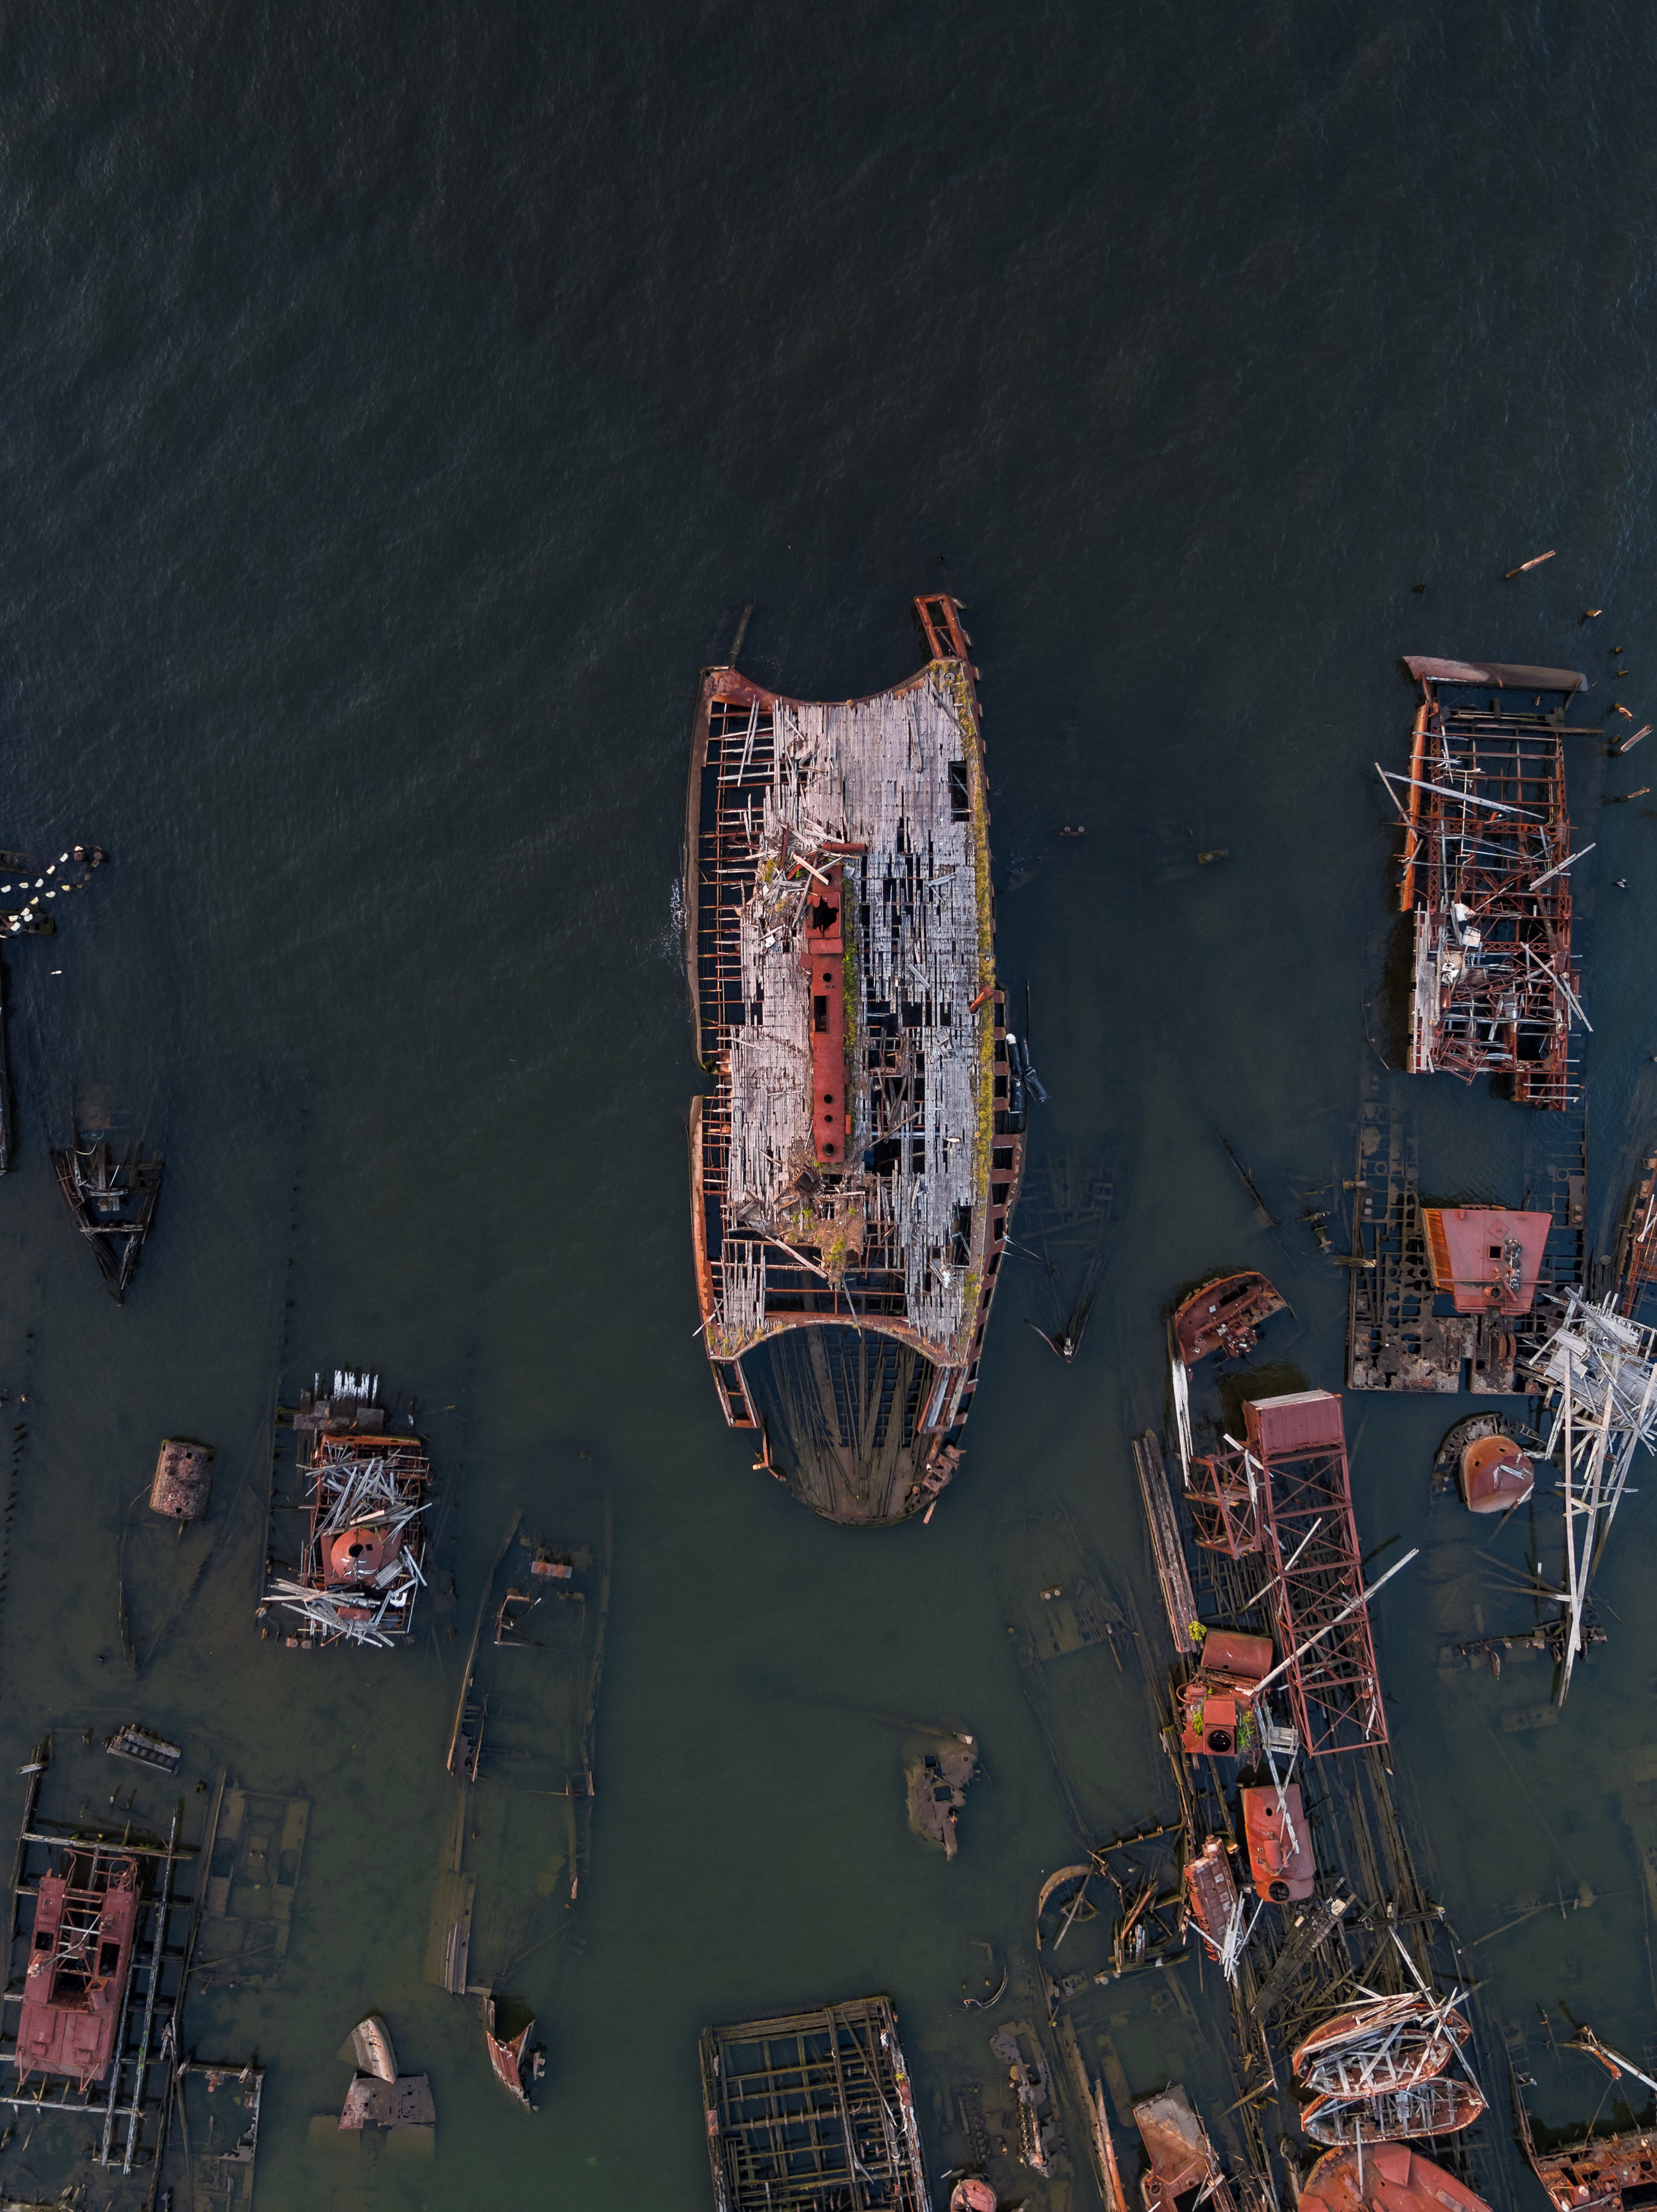 shipwreck_typoland_aerial-1.jpg